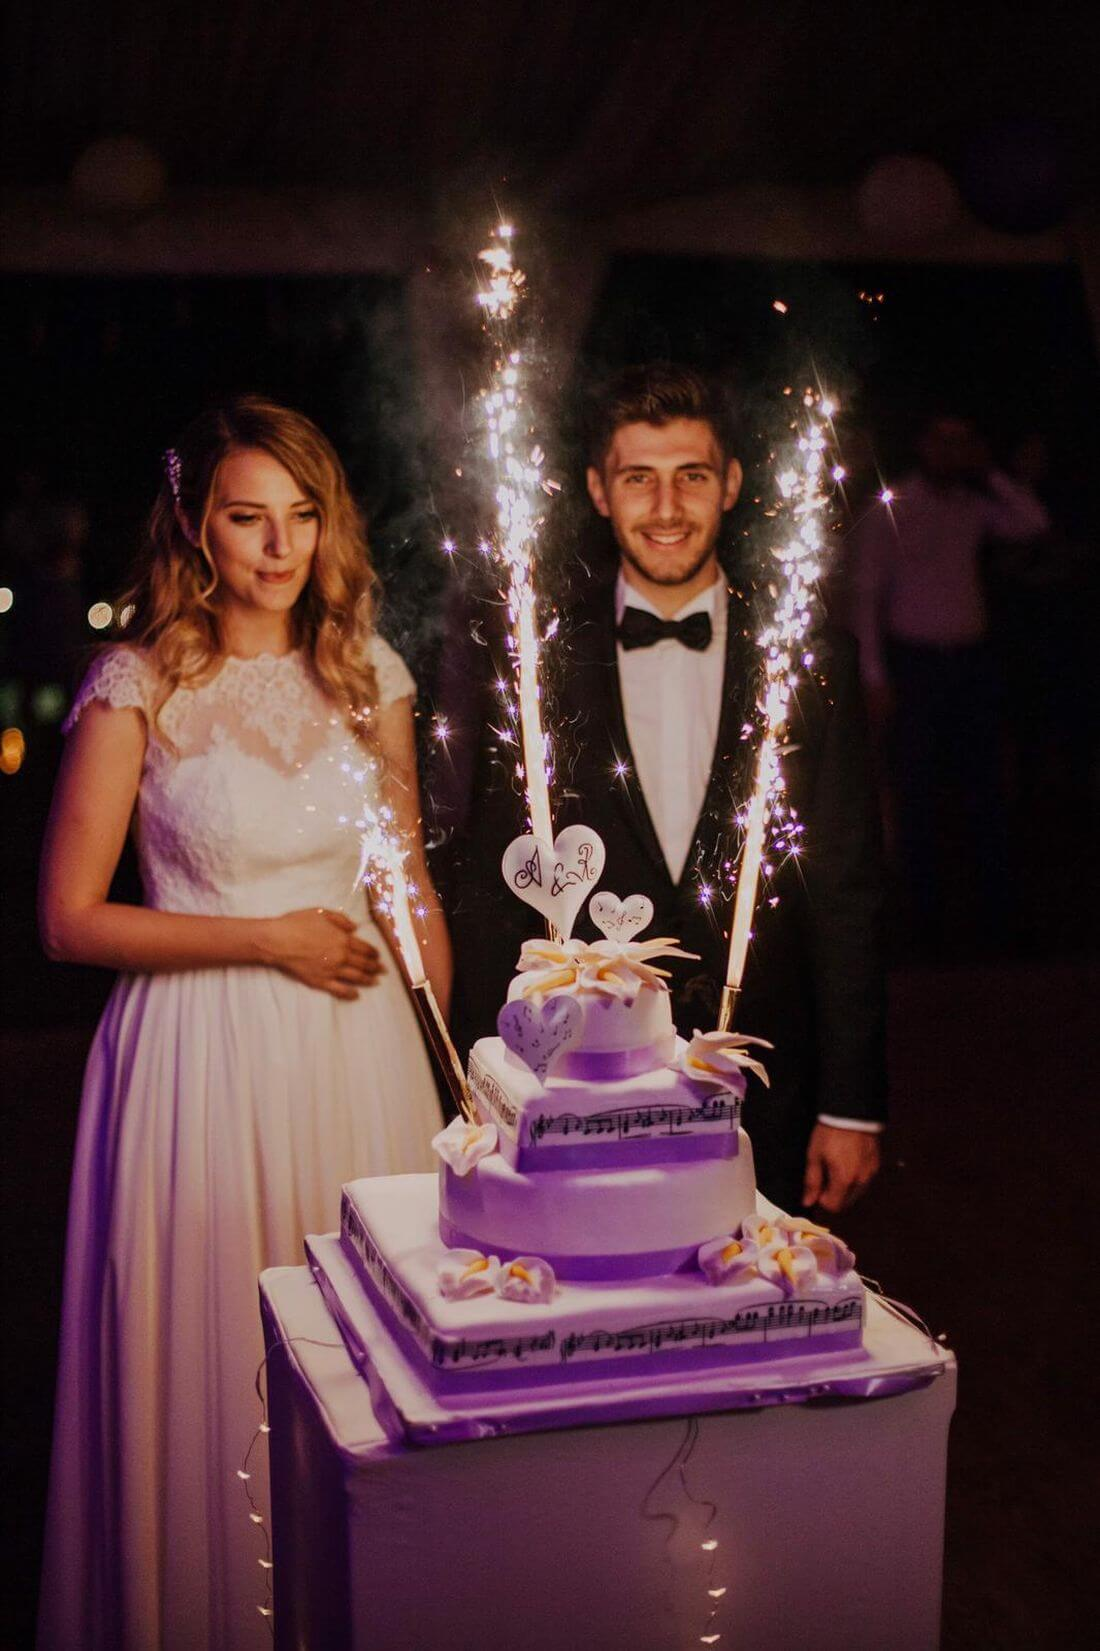 Nunta pe note muzicale – Ana-Maria si Robert – IDO-Weddings-nuntiinaerliber (1)